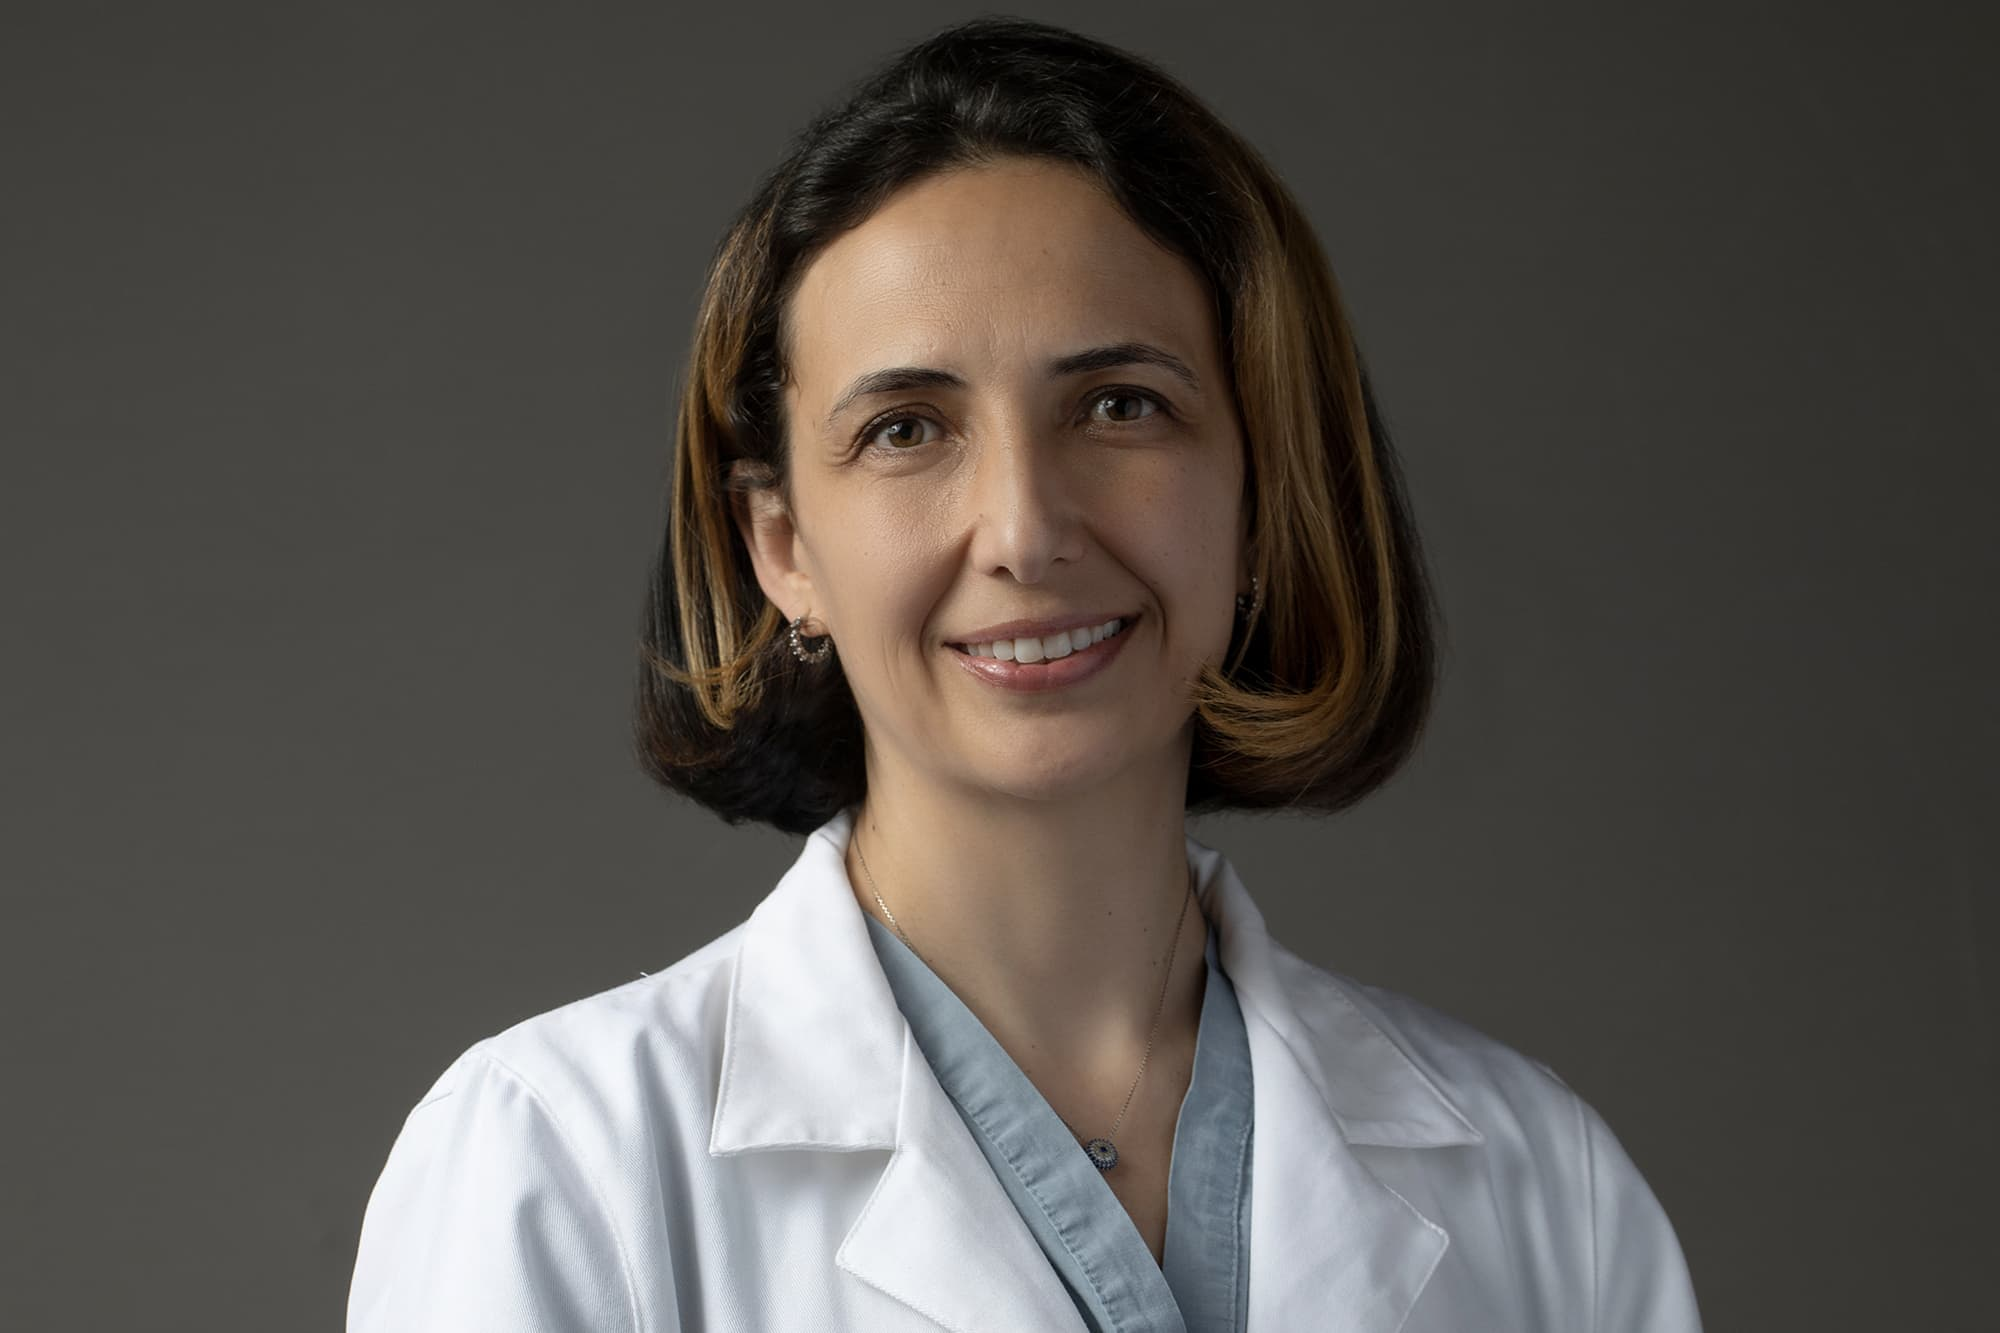 Inci Yildirim, MD, PhD